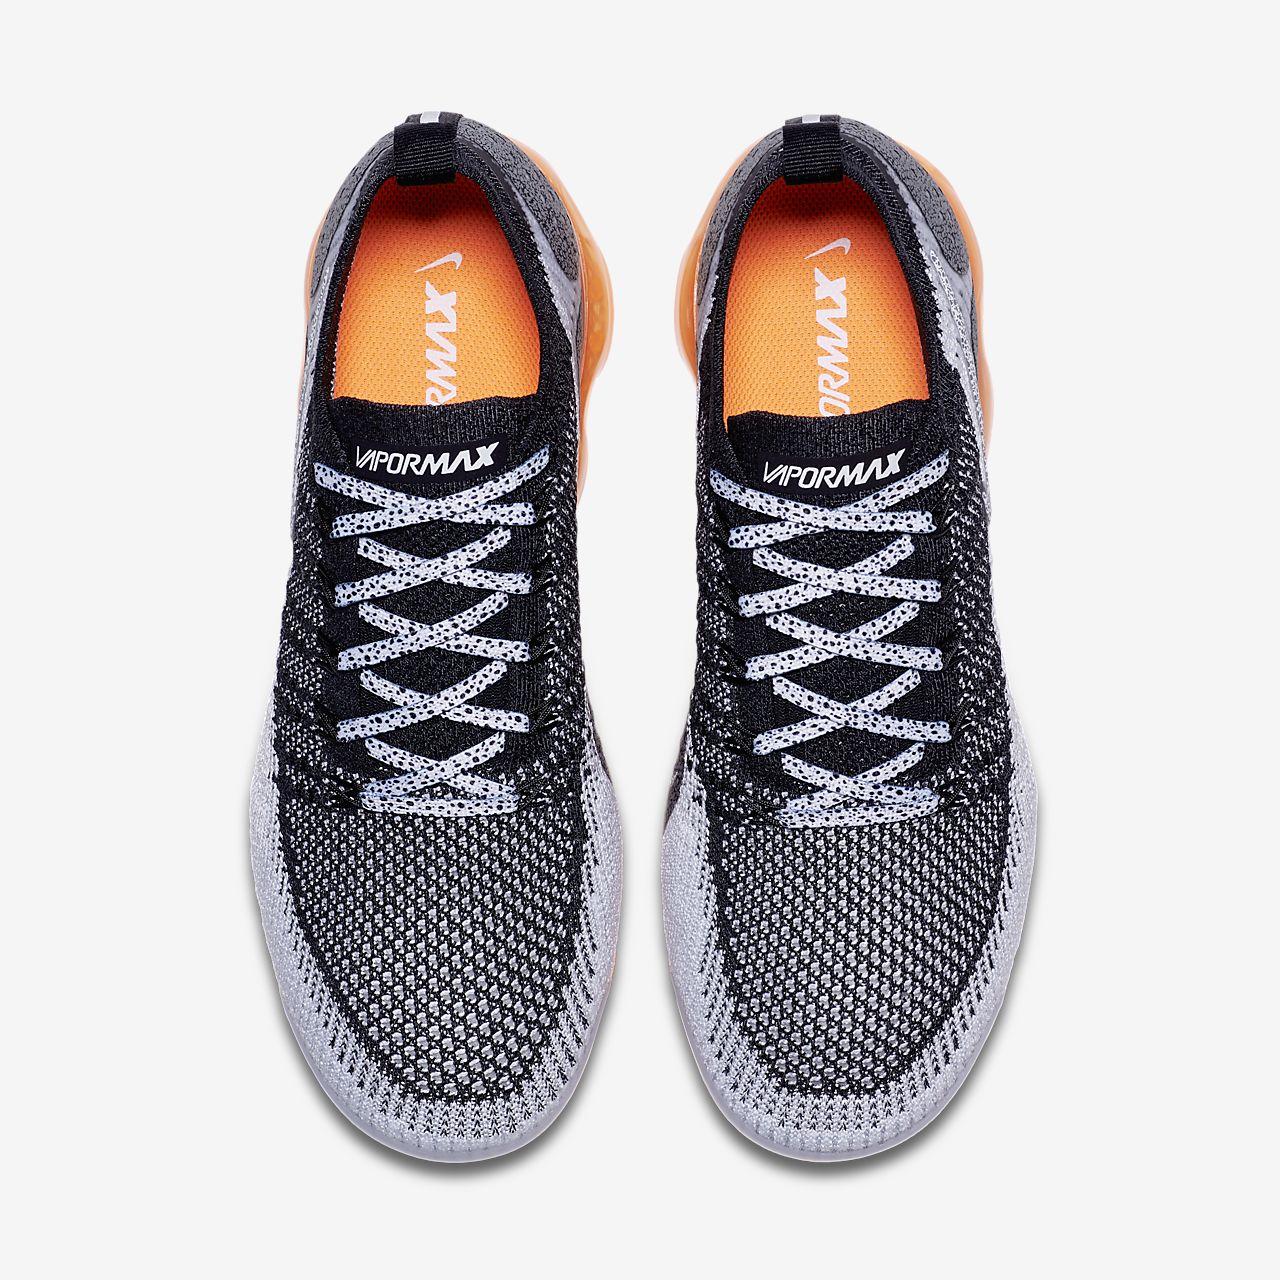 innovative design 07986 03cca ... Scarpa Nike Air VaporMax Flyknit 2 Safari